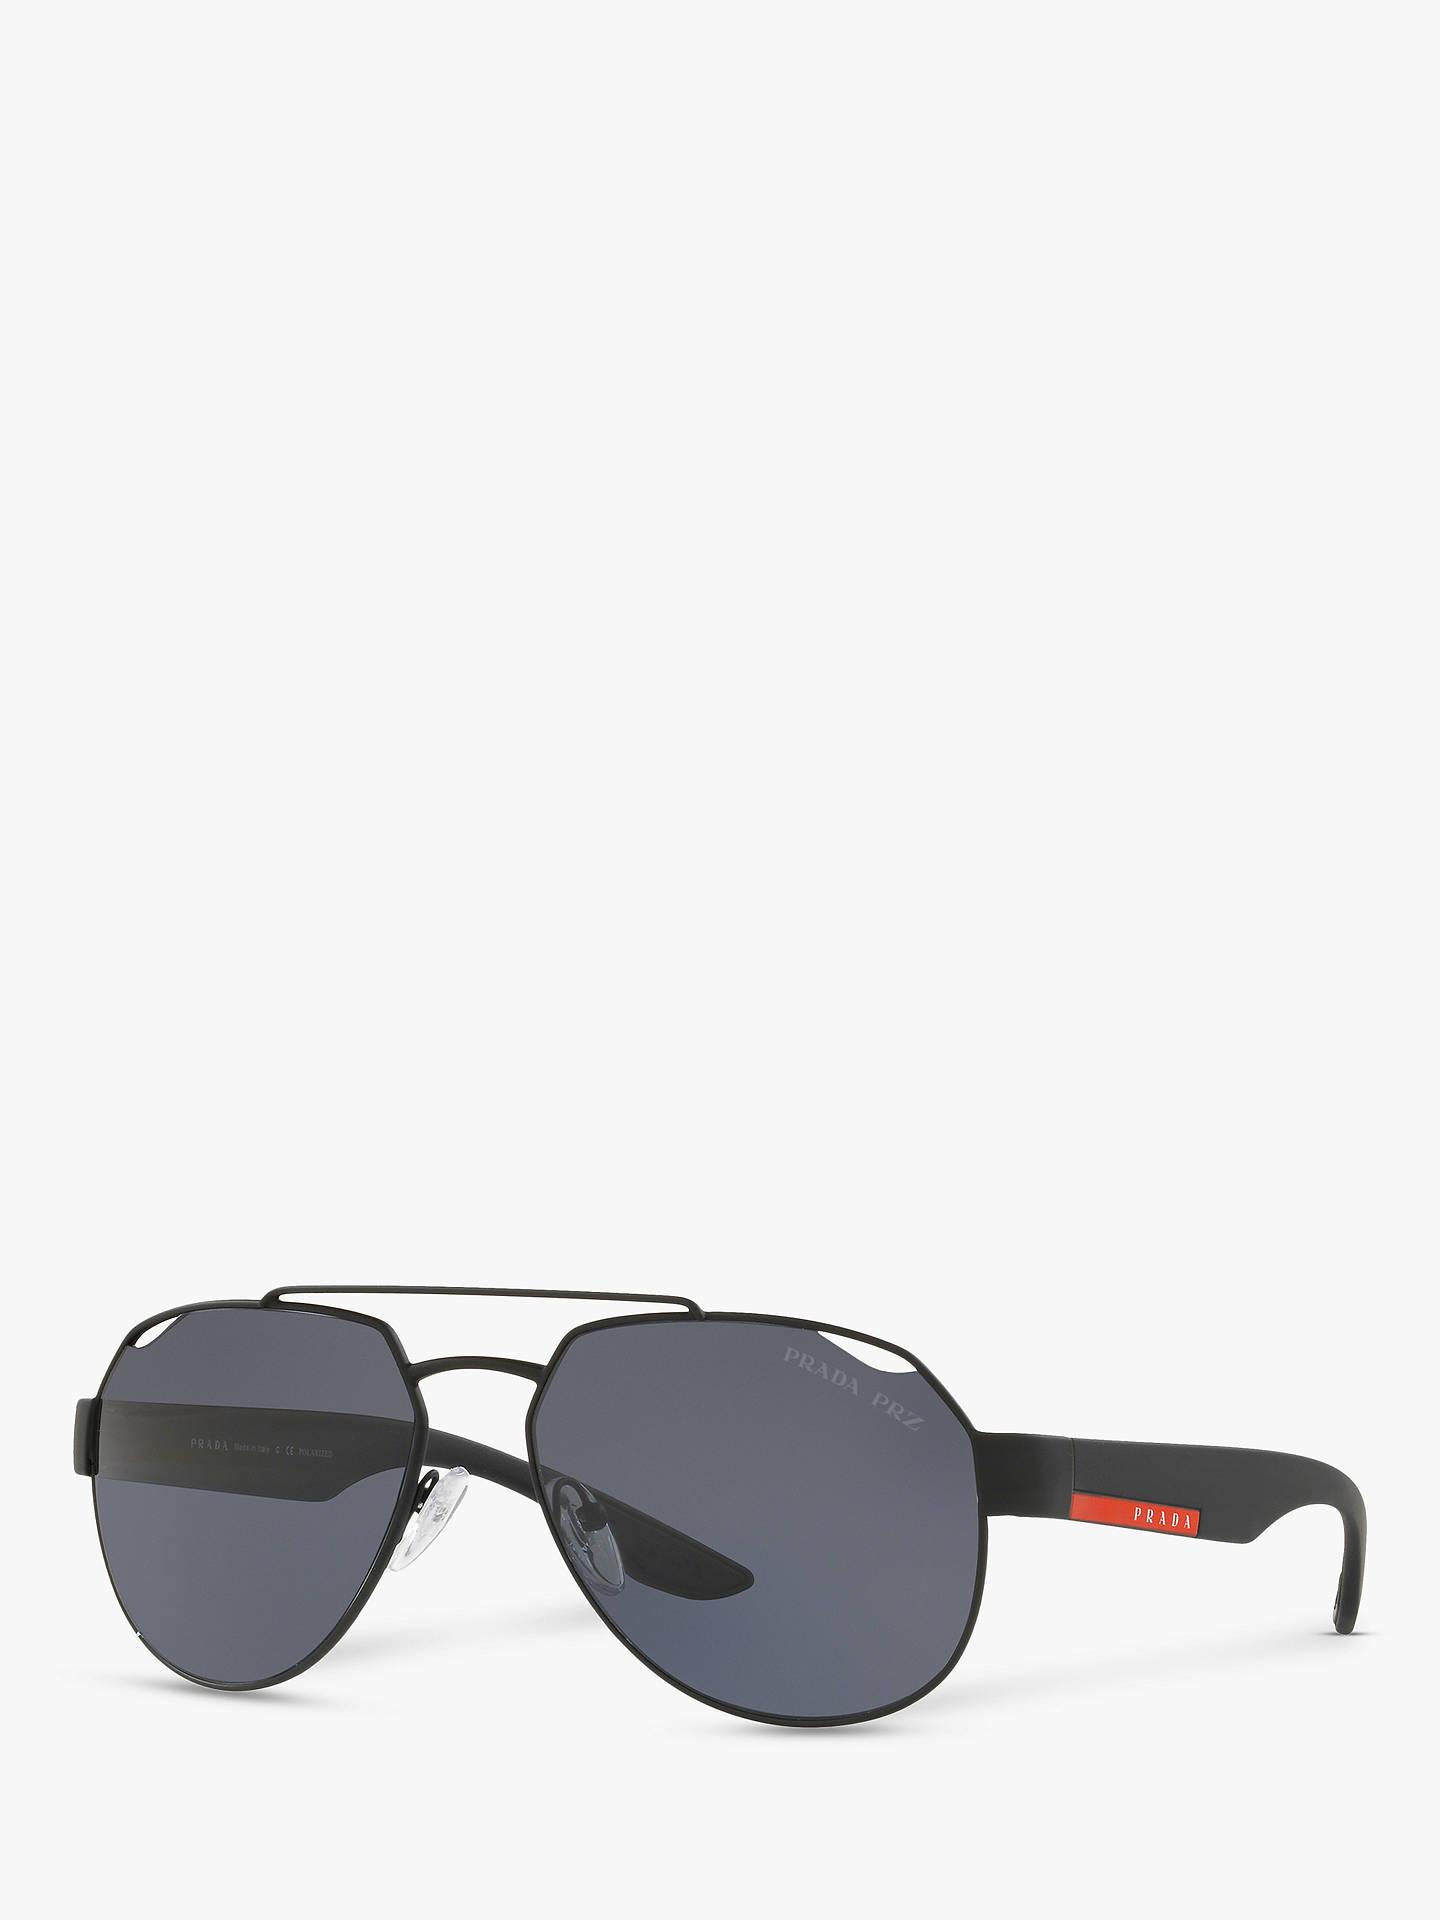 1a1403525b93 Buy Prada PS 57US Men s Polarised Rectangular Sunglasses